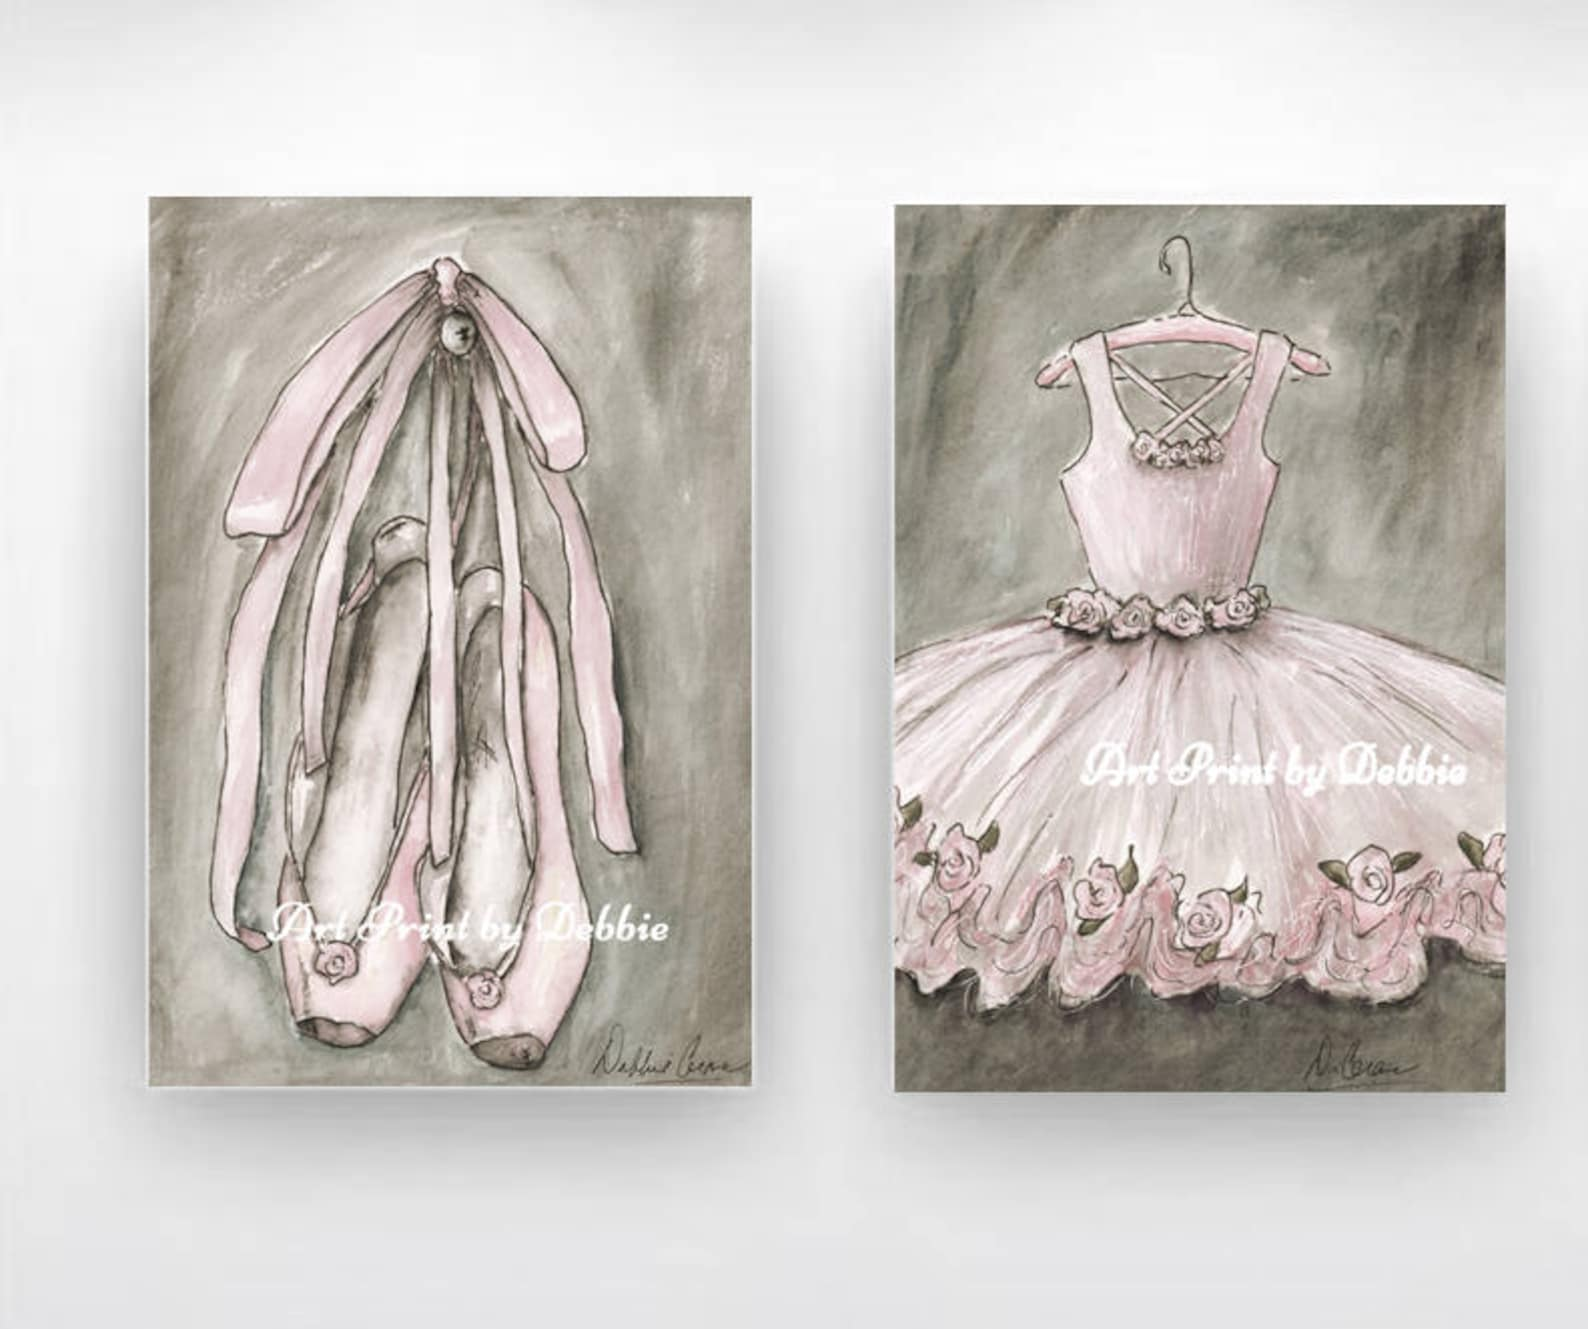 girls room decor blush ballerina set of 2, girls ballet prints, ballerina art, blush pink nursery ballerina decor, 6 sizes 5x7 t